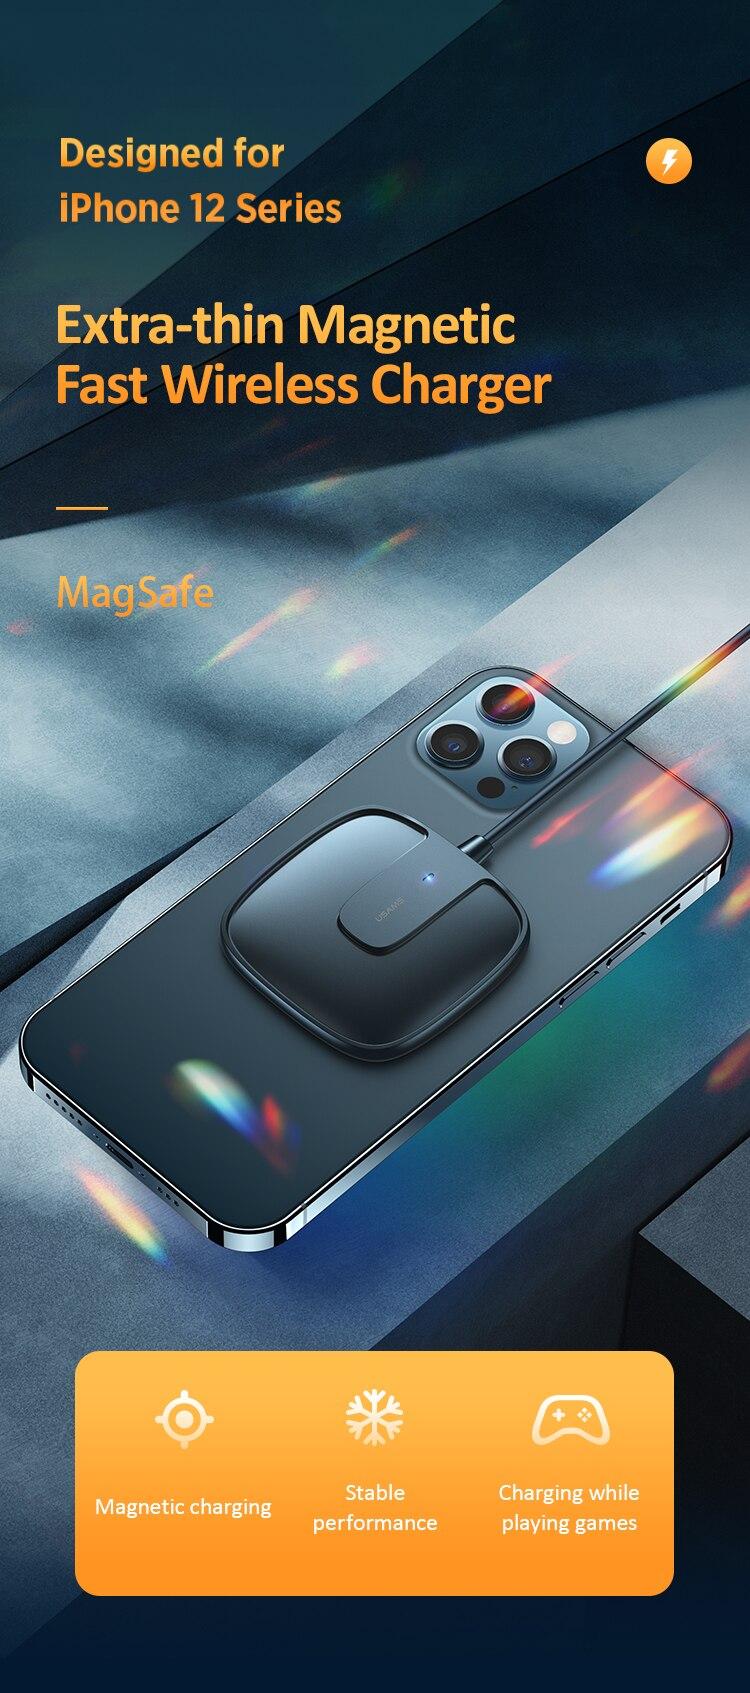 W1-苹果超薄磁吸无线快充充电器带线款-US-CD159_01